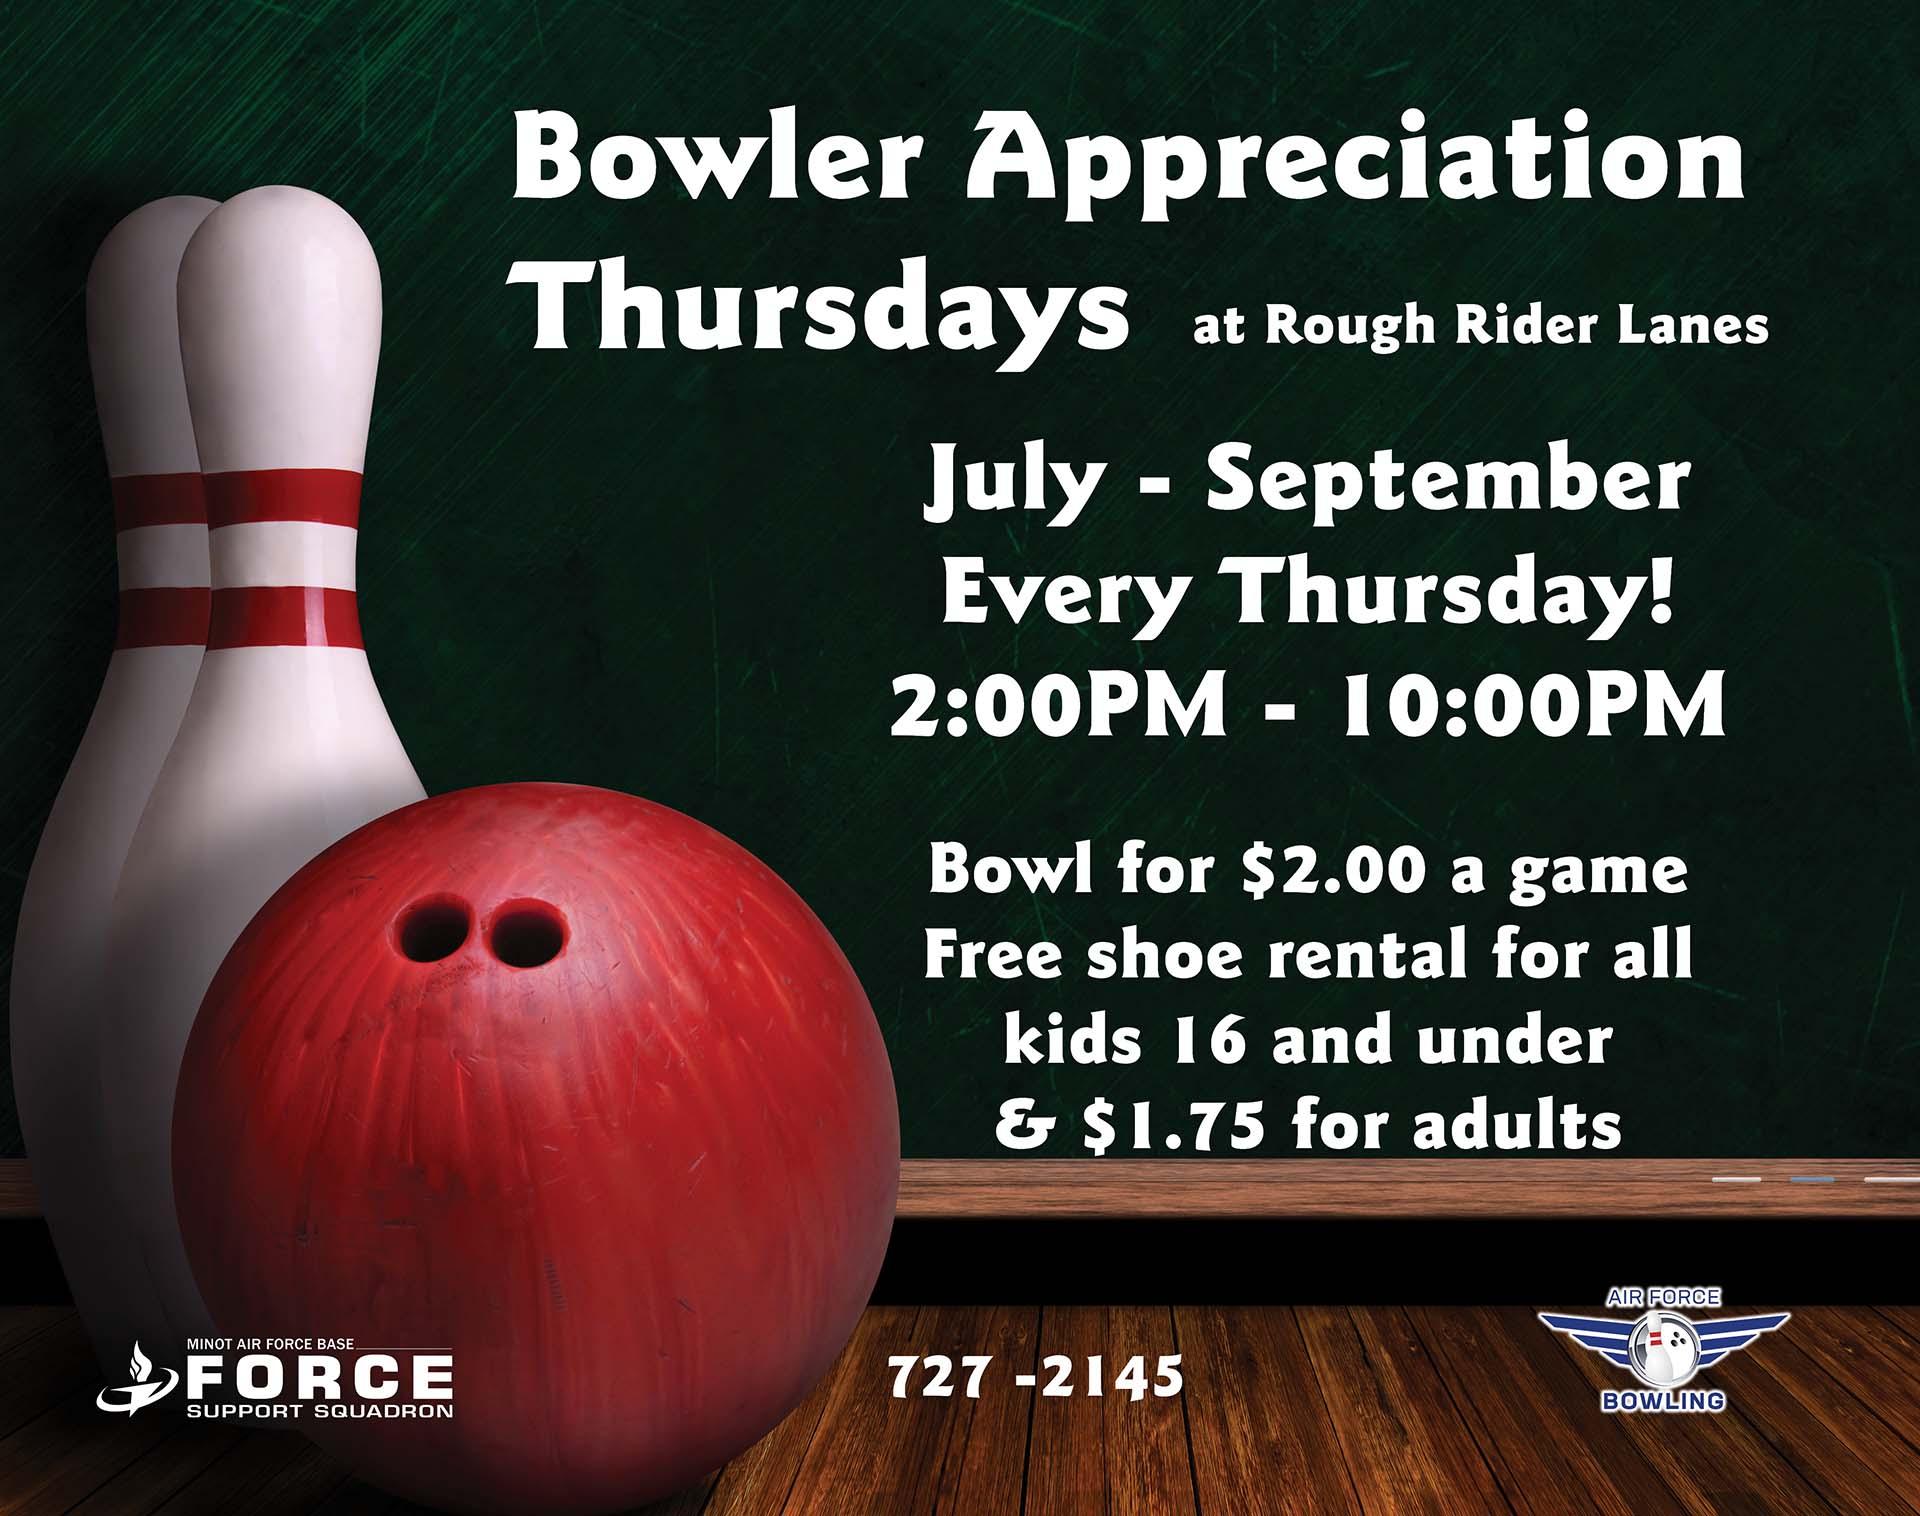 Bowler Appreciation Thursday